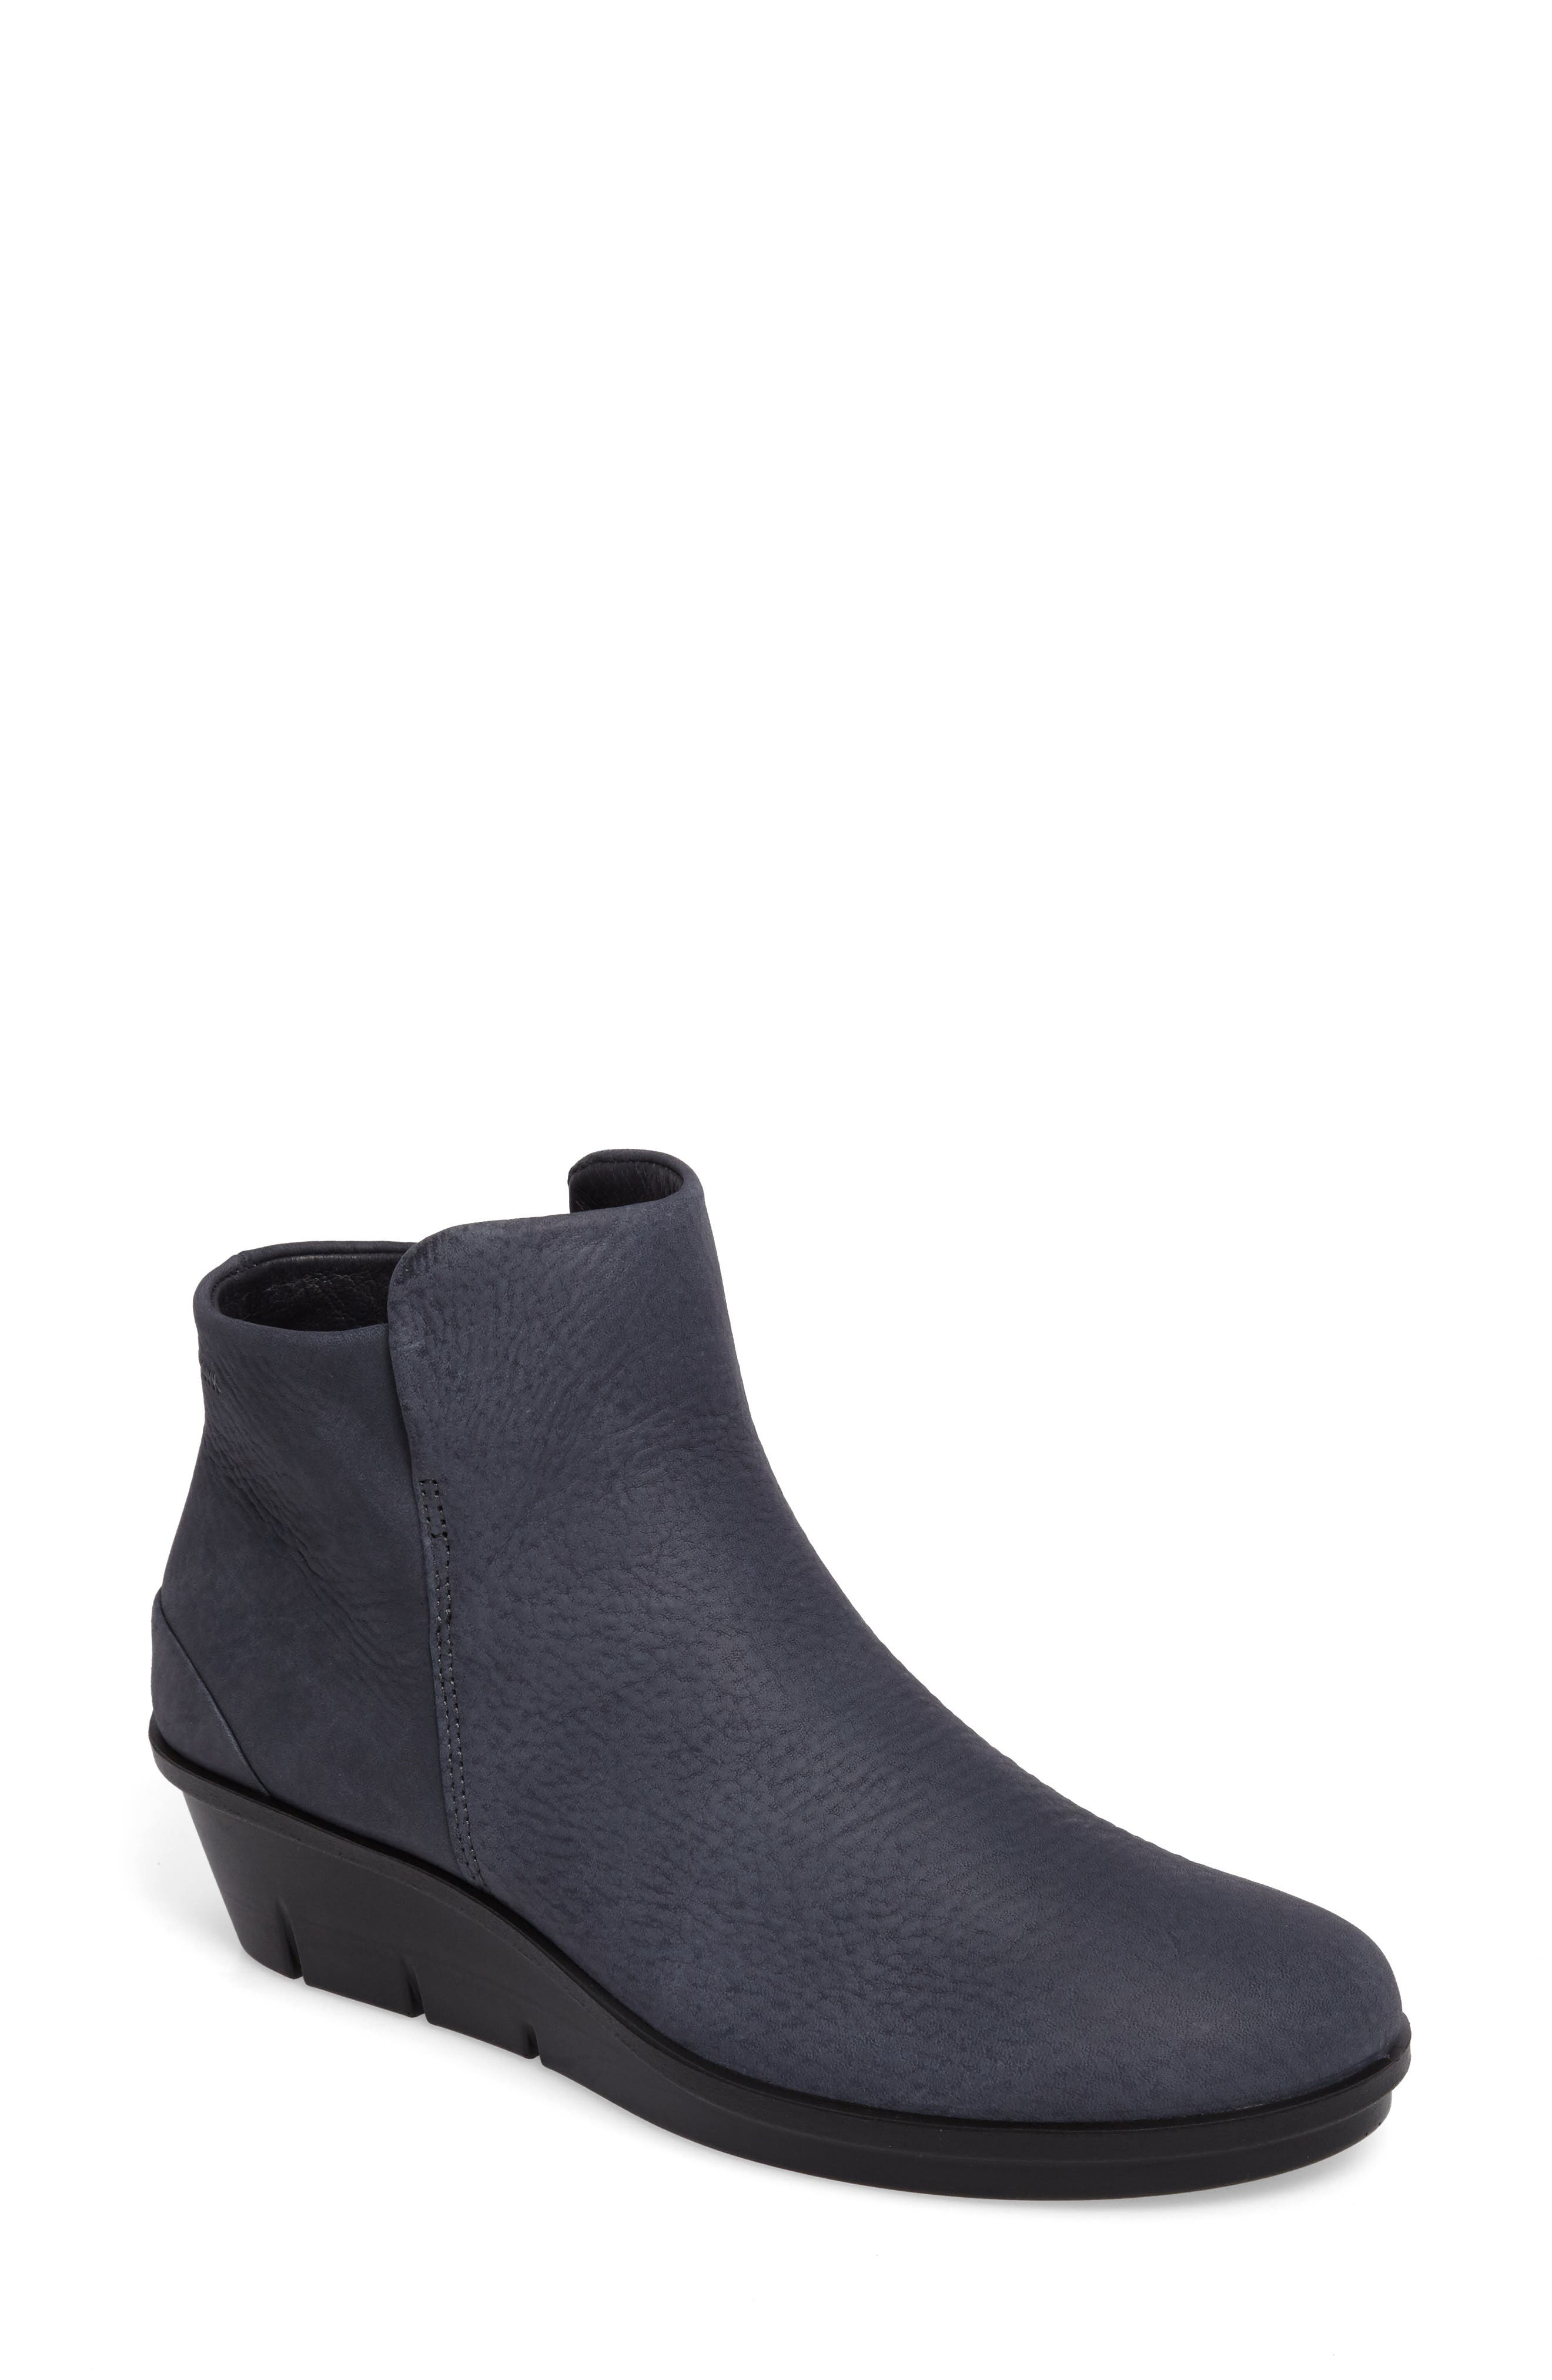 Ecco Skyler Wedge Boot, Blue